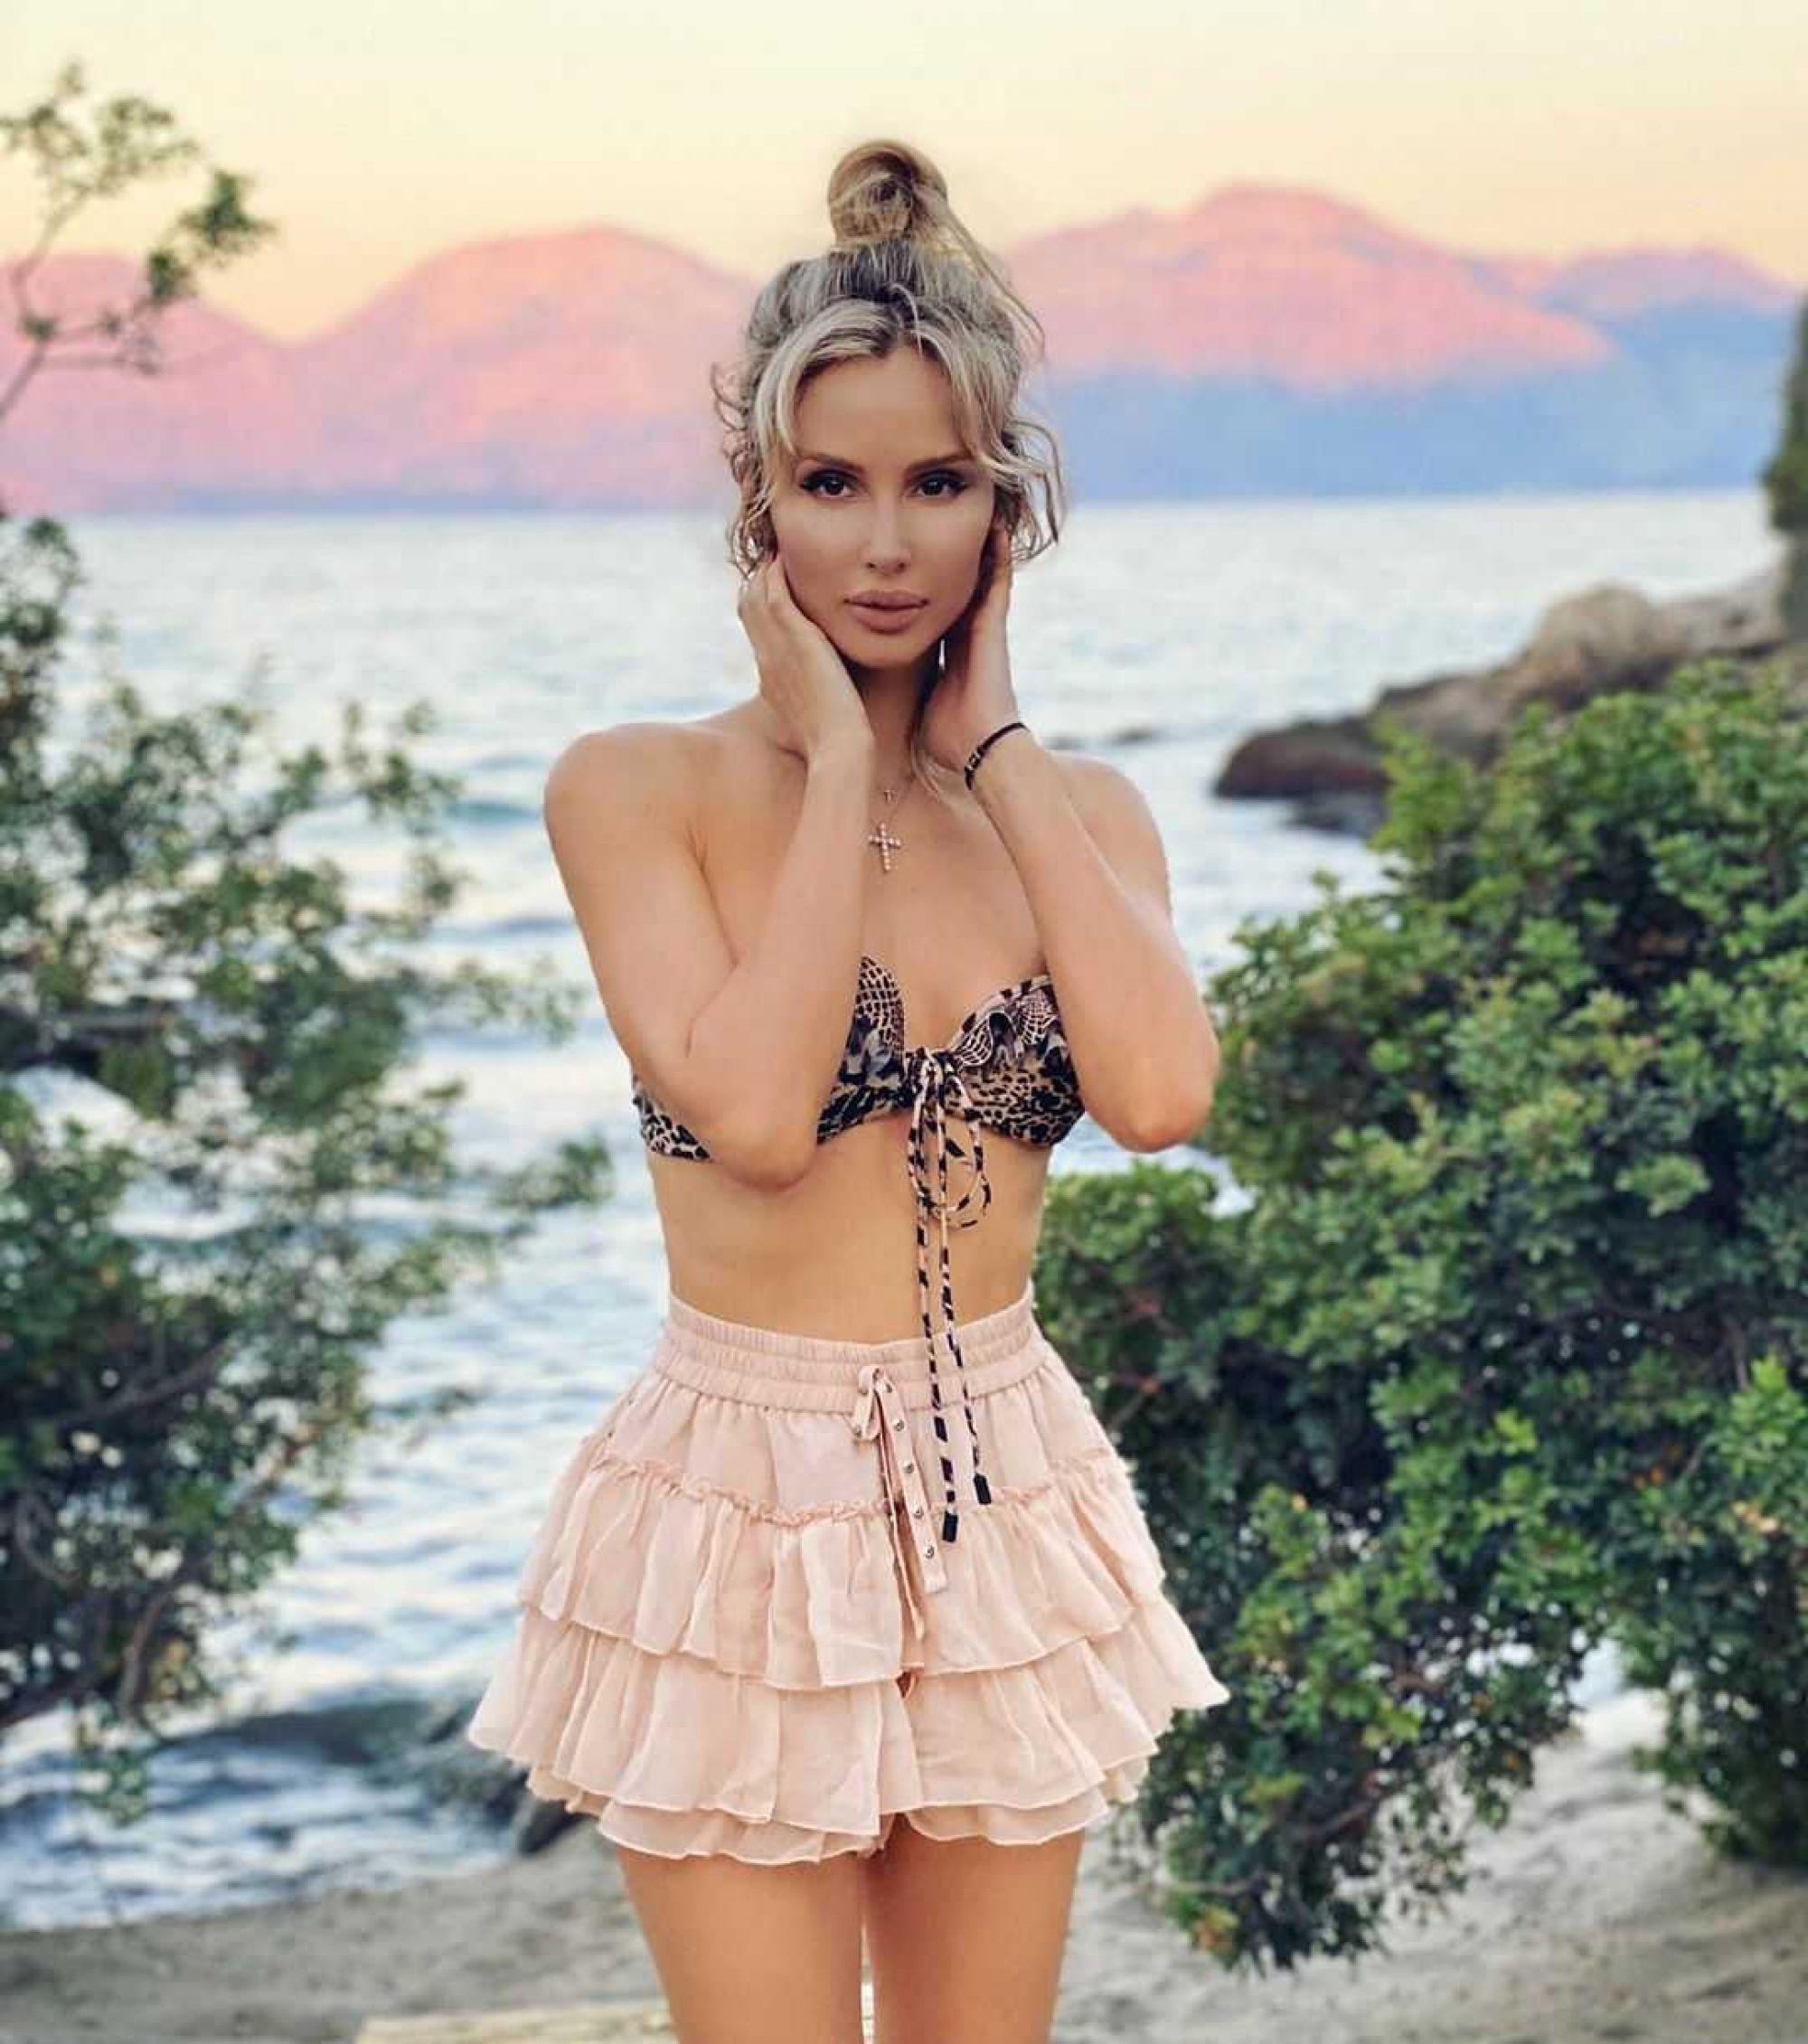 «Какая роскошная!»: Светлана Лобода показала фанатам младшую сестру